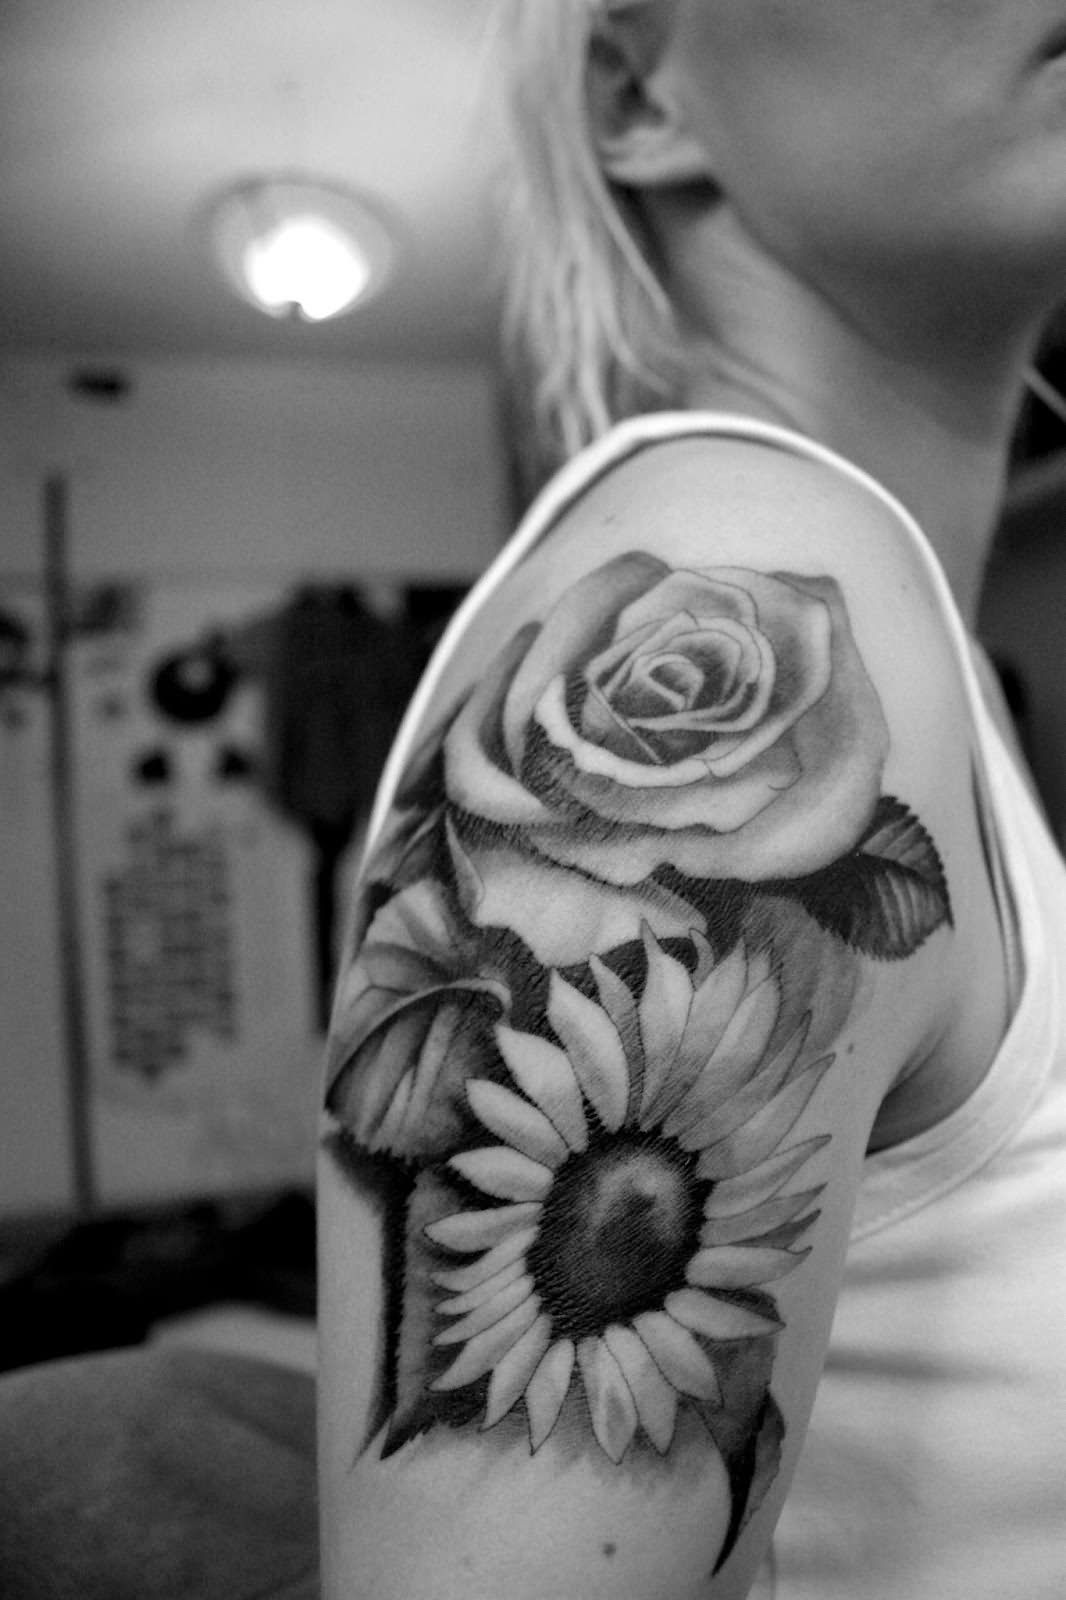 Black tattoo cover up ideas  beautiful daisy tattoos on shoulder  tattoo ideas  pinterest